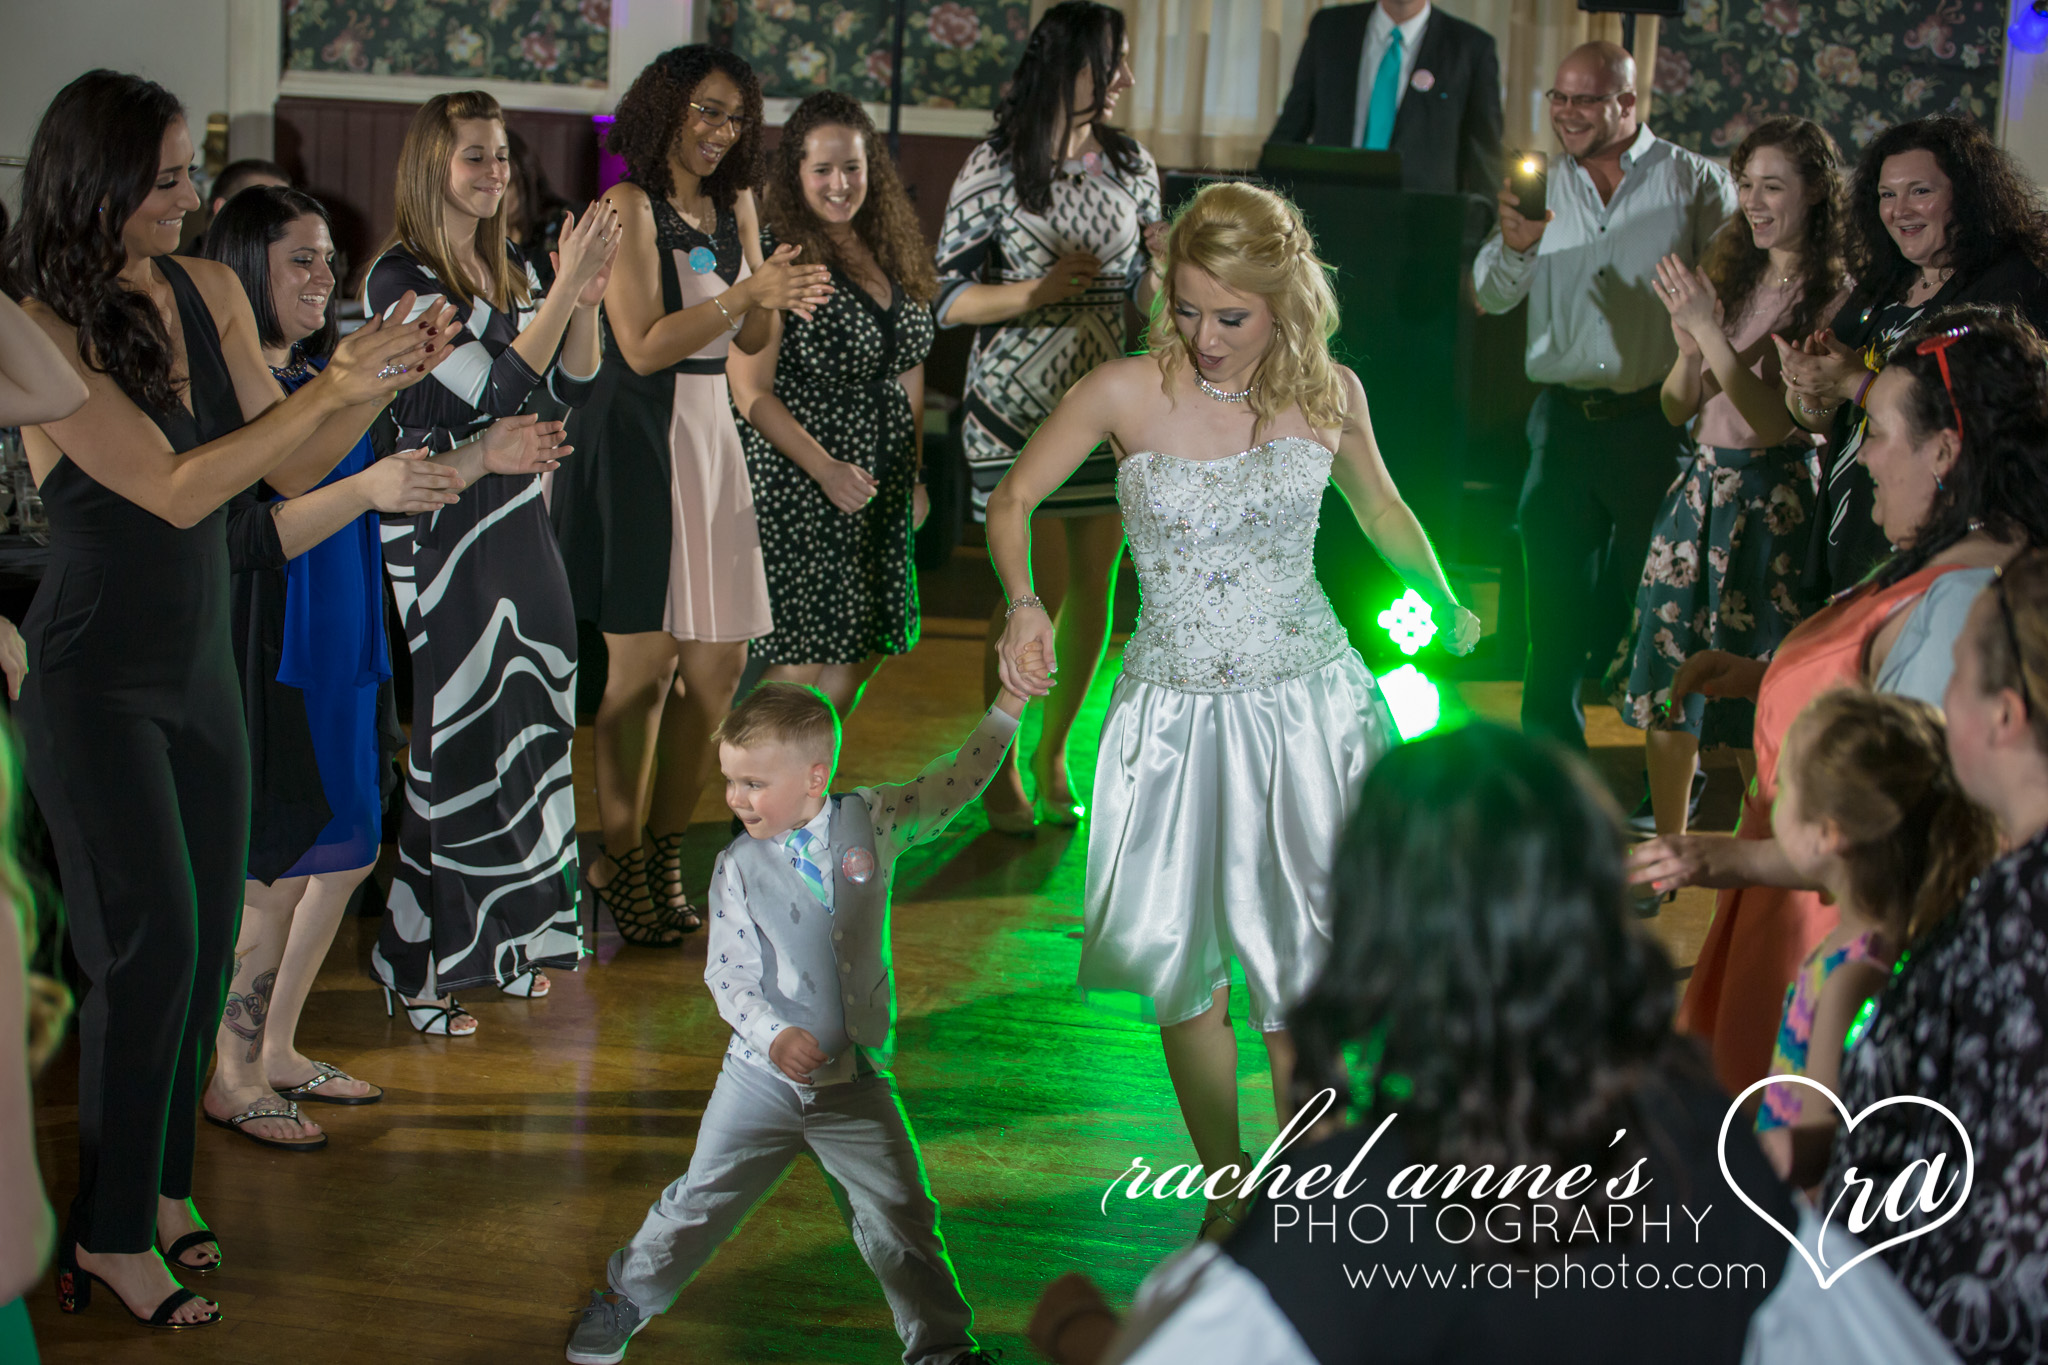 074-JKS-WEDDINGS-THE-FRANKLIN-PA.jpg